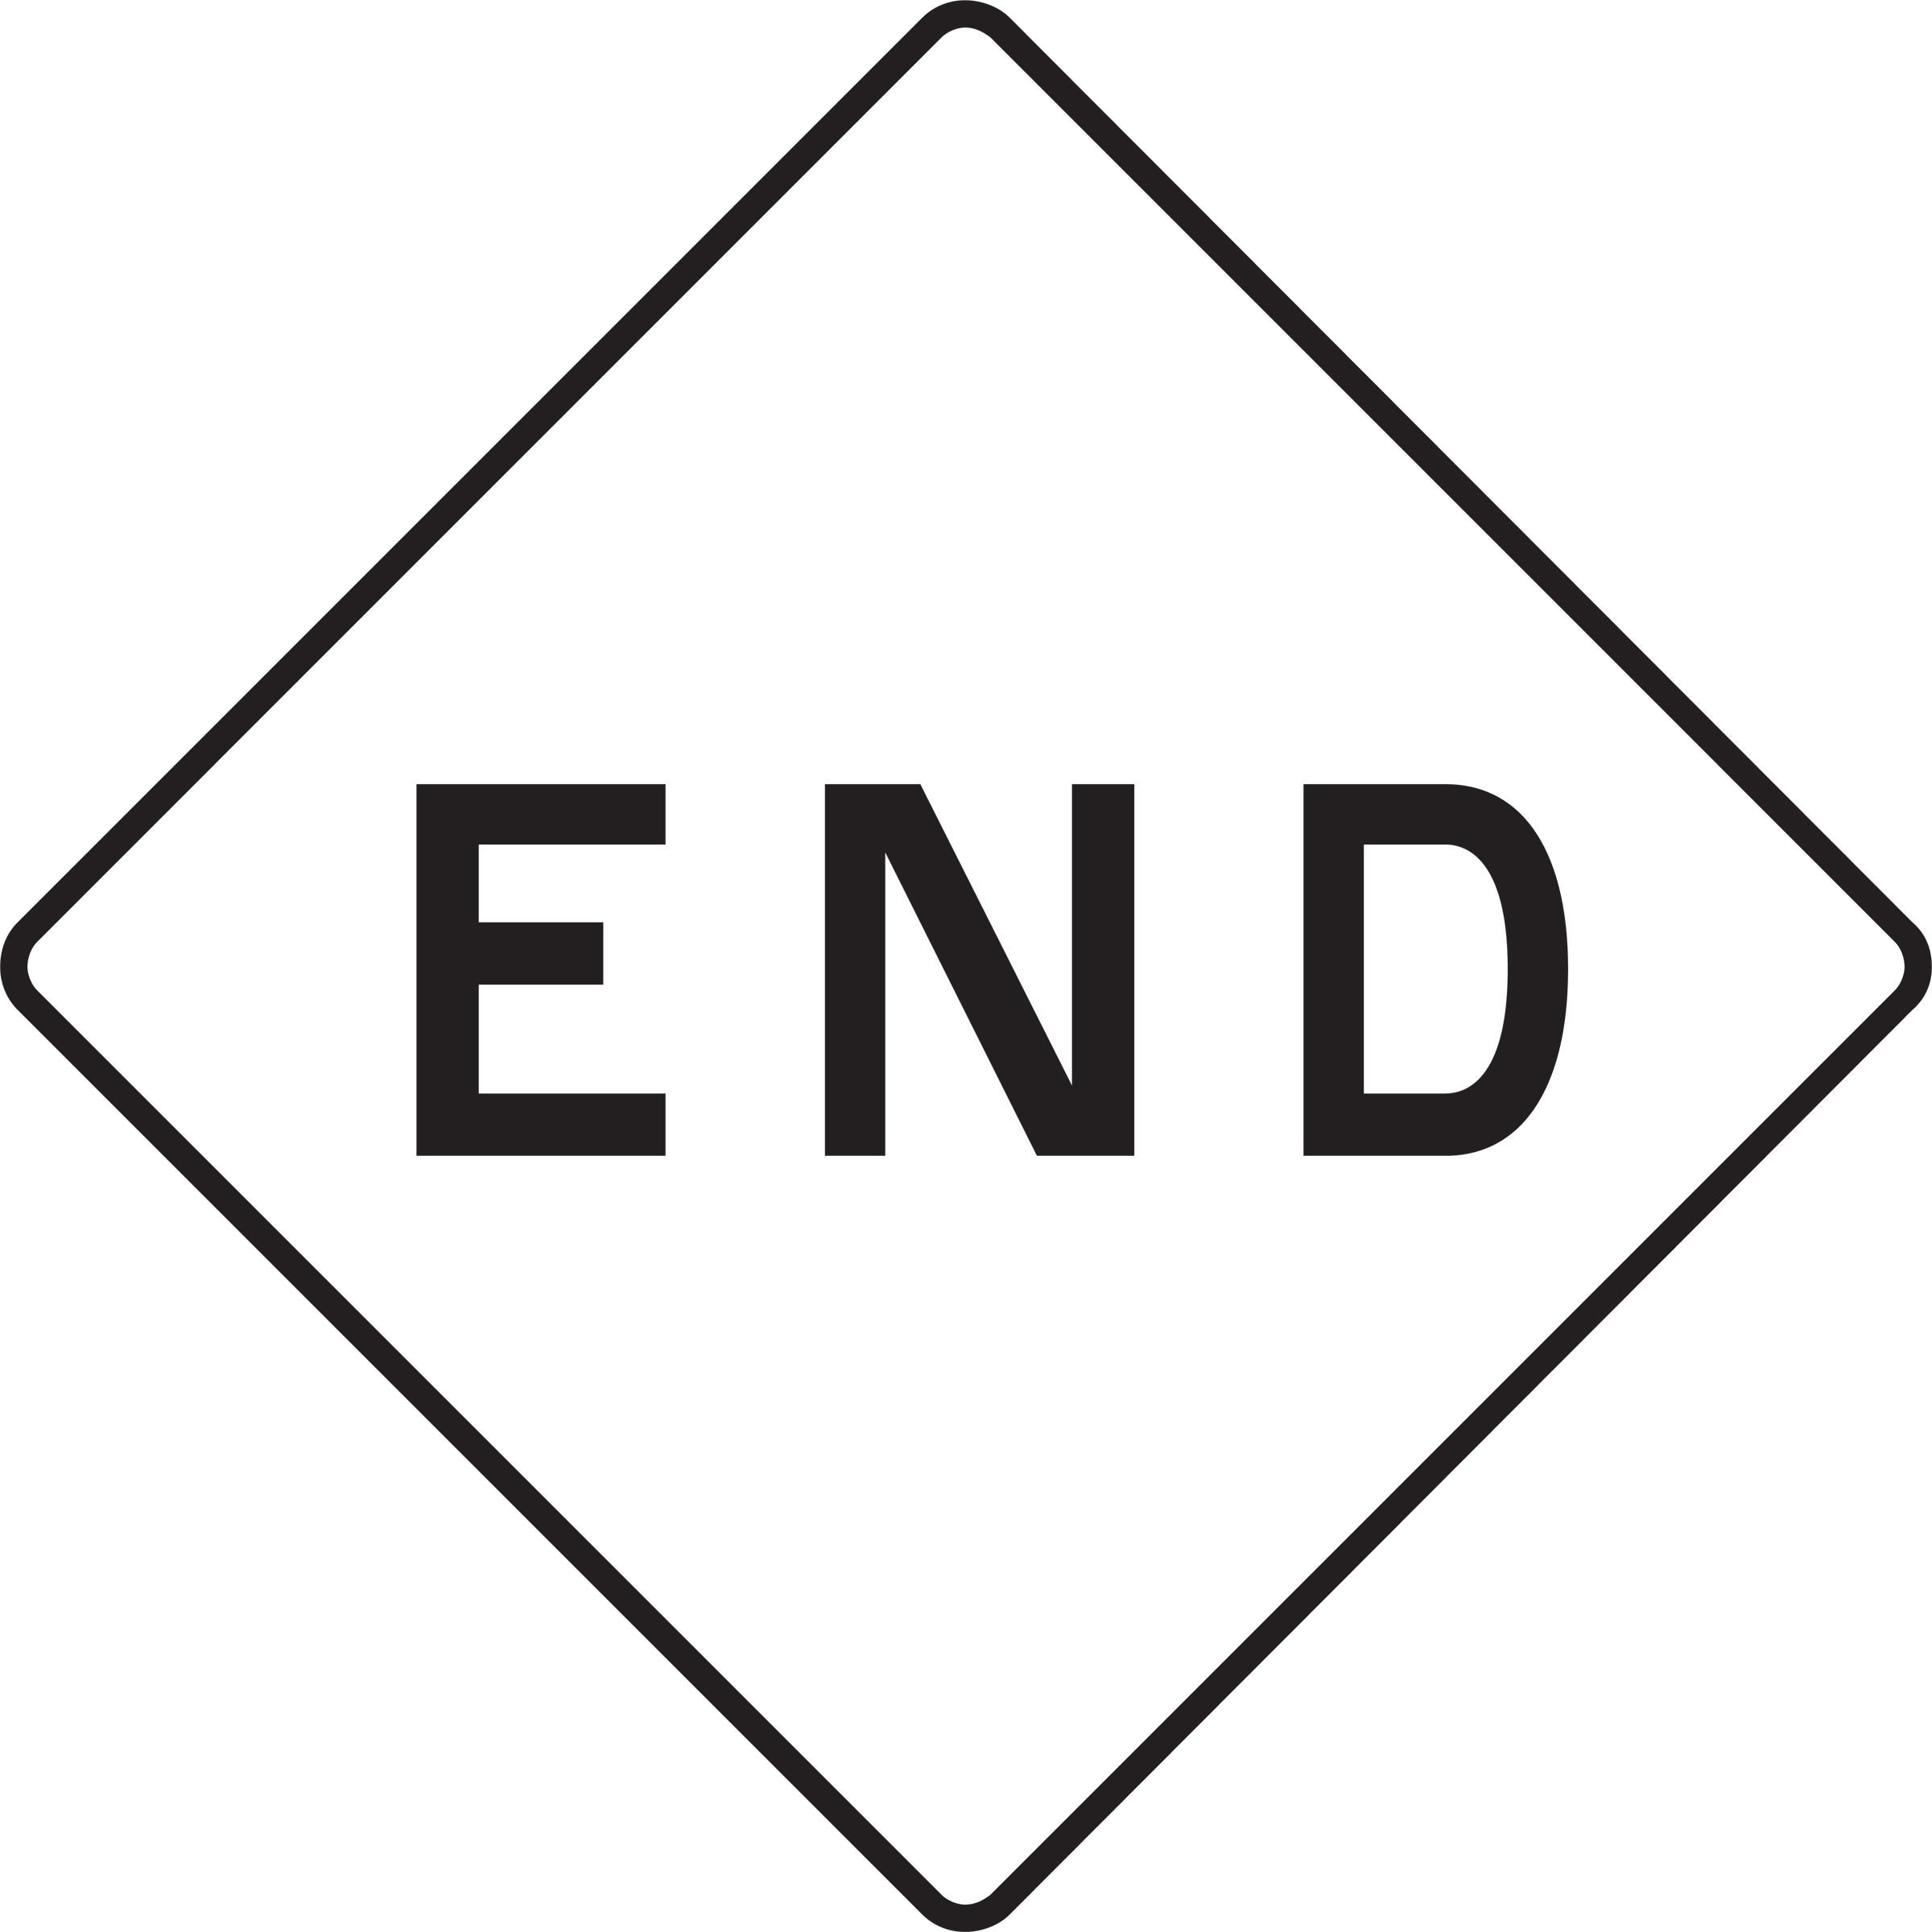 Ending Clipart